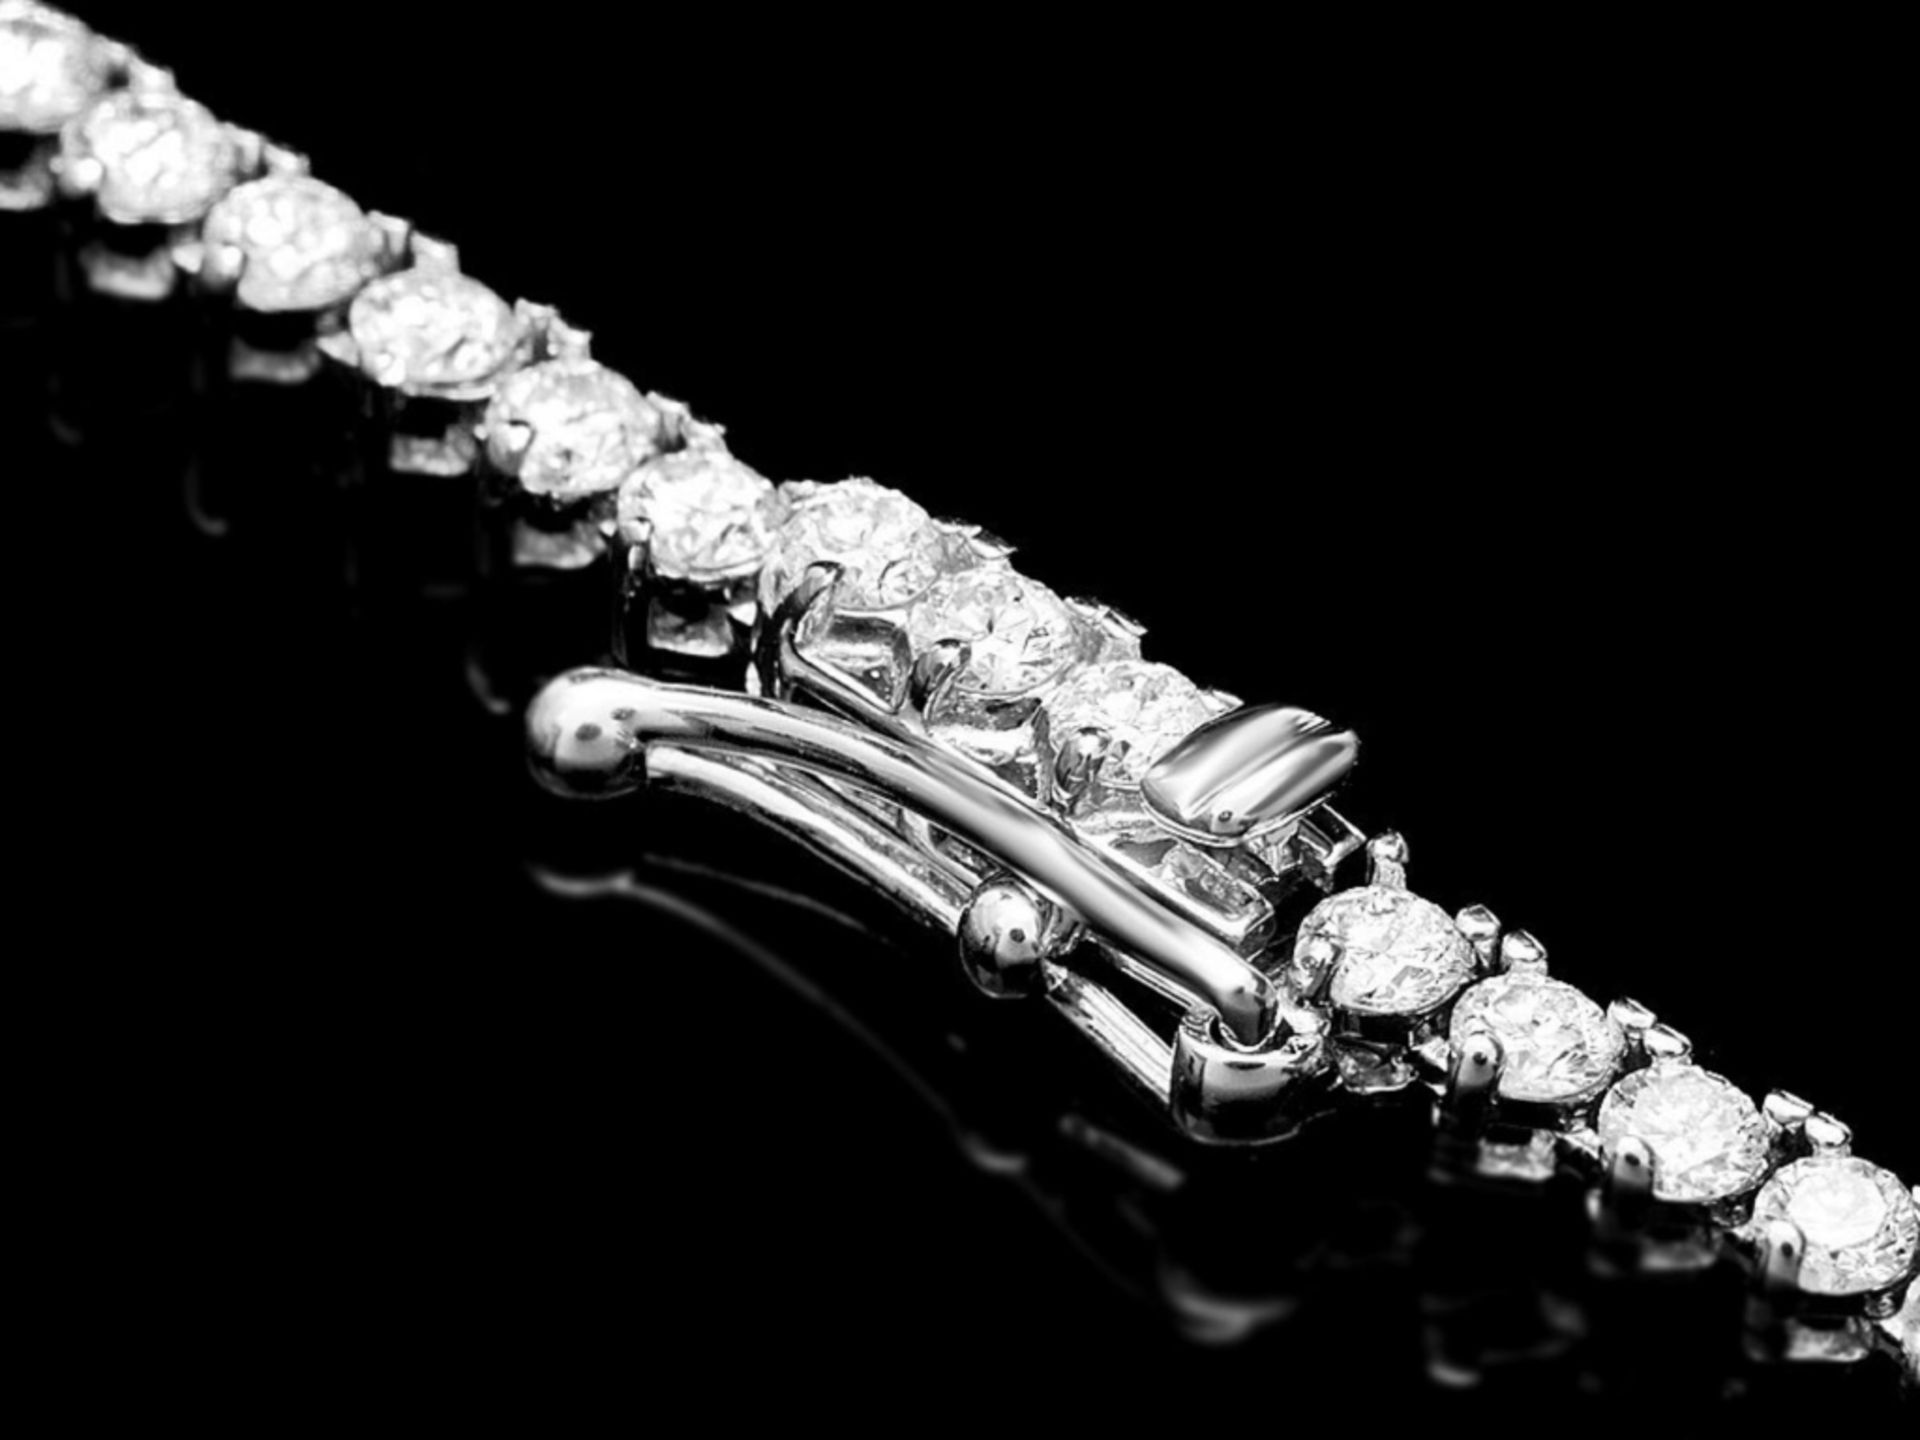 ^18k White Gold 6.80ct Diamond Necklace - Image 2 of 3